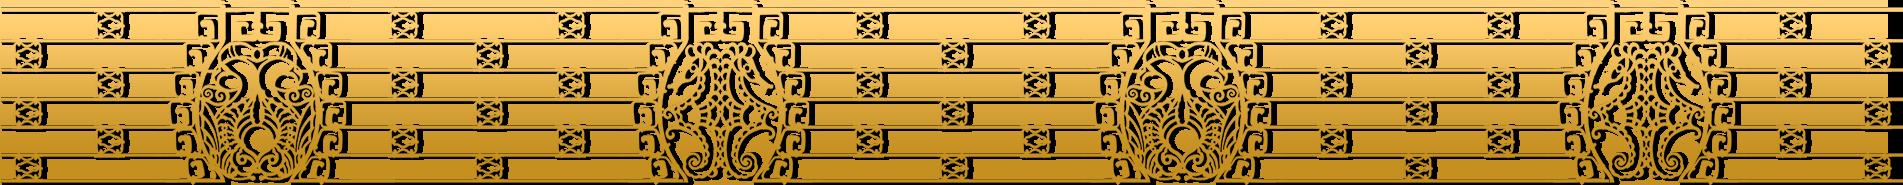 gelnder-trenner